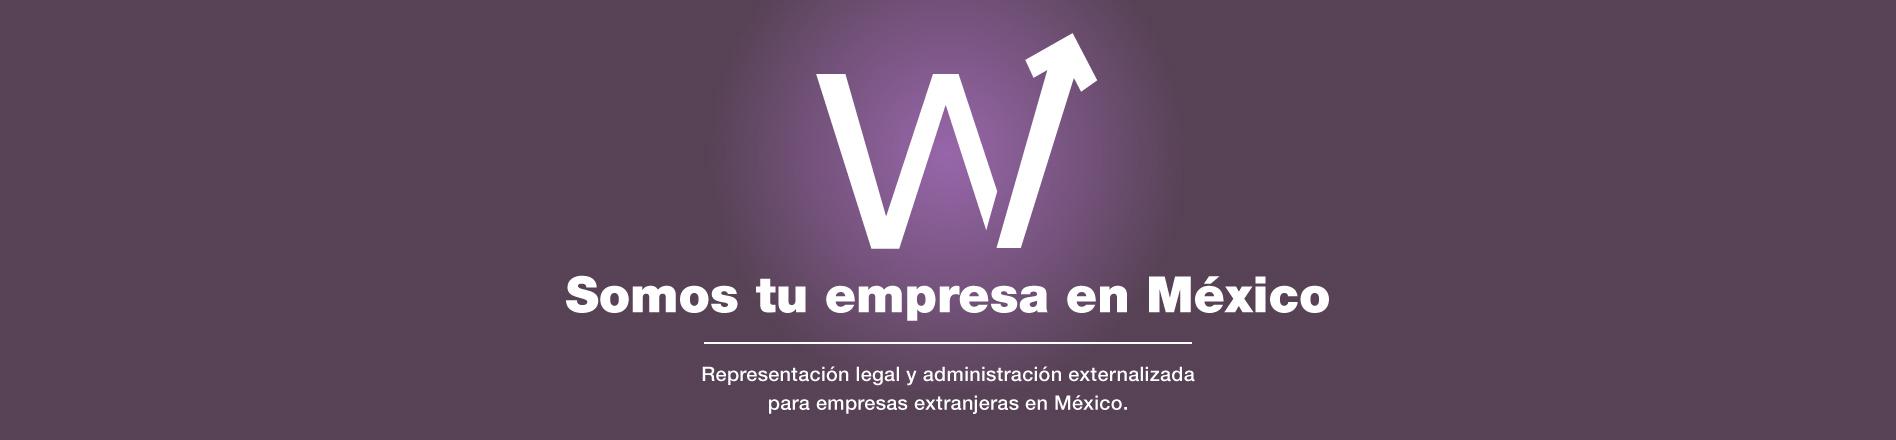 GWP_WEB_Carrusel_RepresentacionLegal2